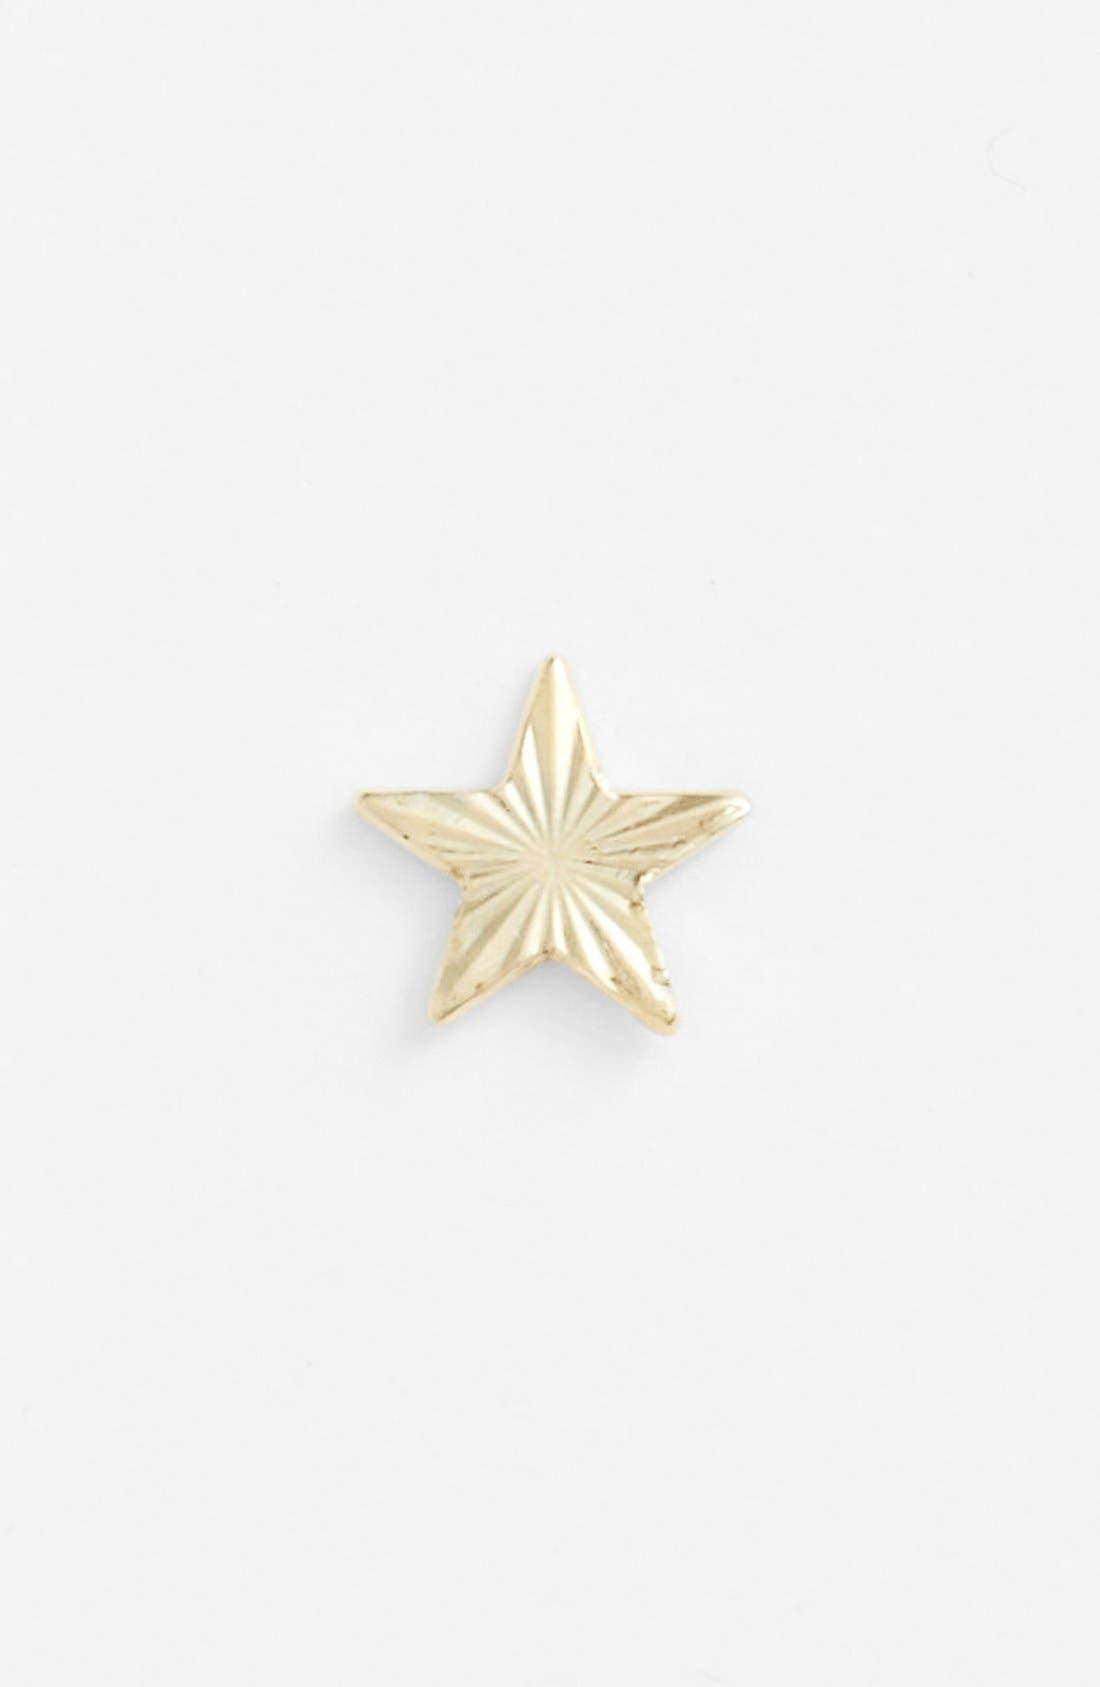 Alternate Image 1 Selected - Bonnie Jonas 'Star' Stud Earring